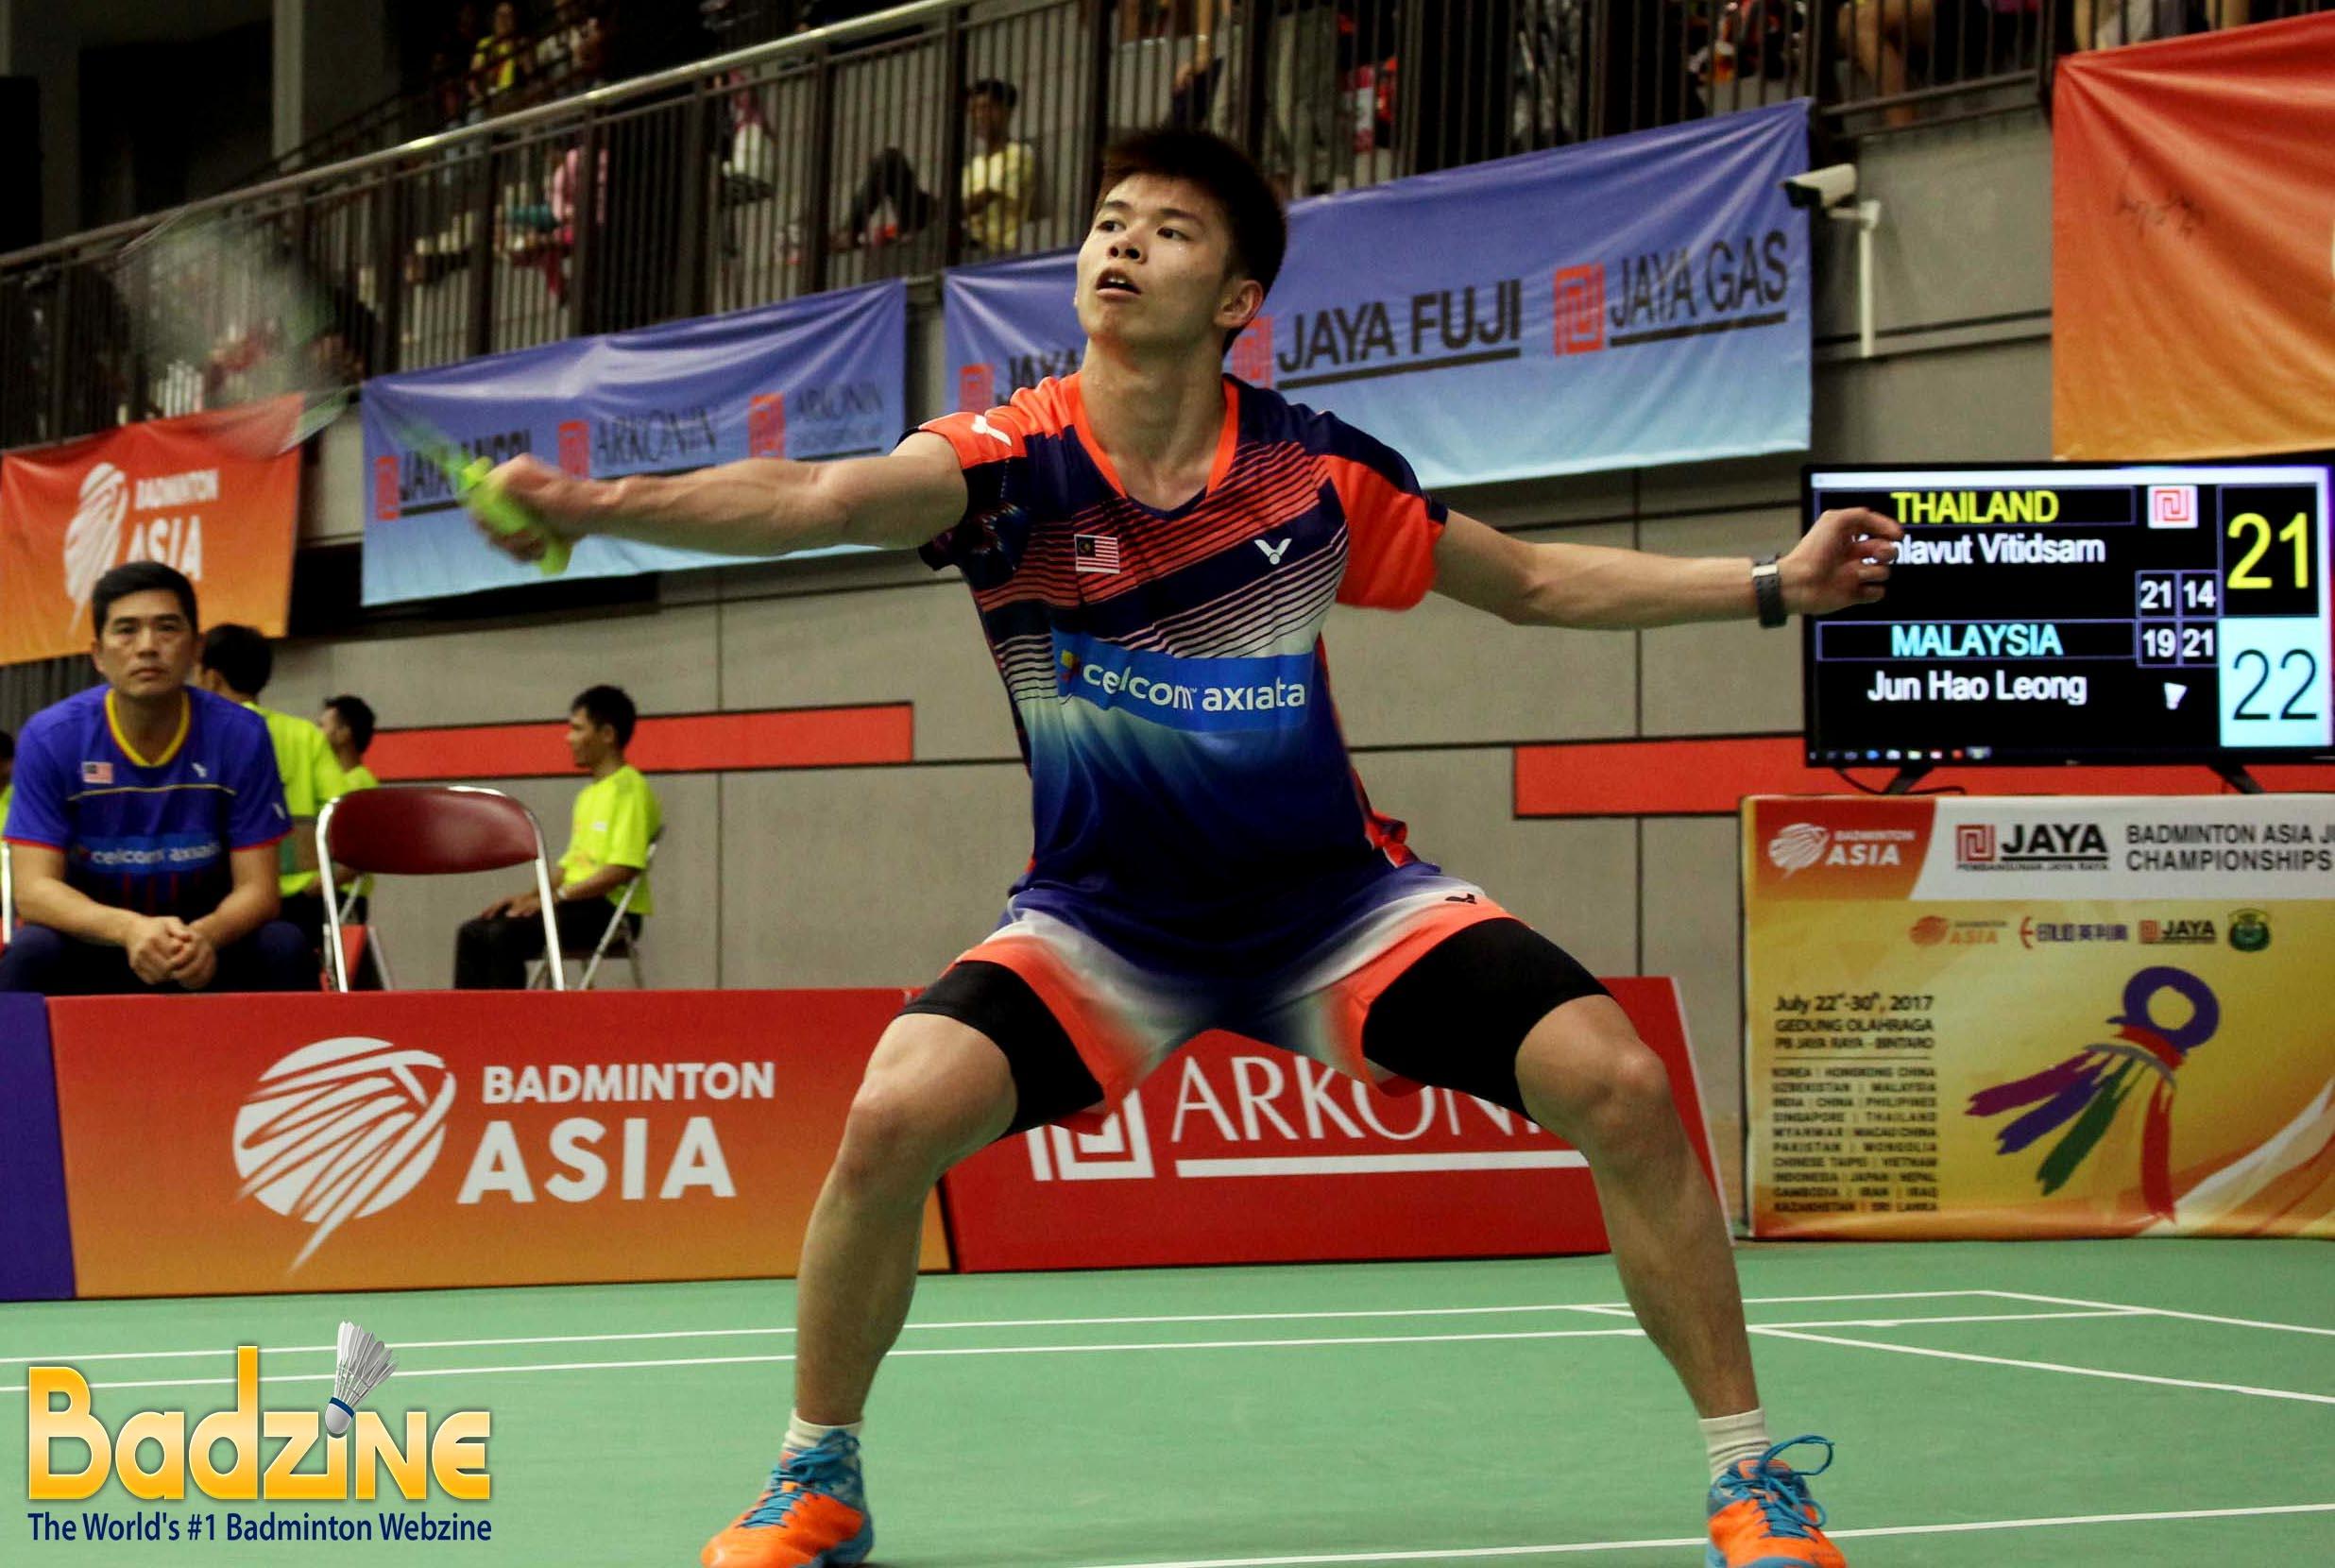 Leong Jun Hao